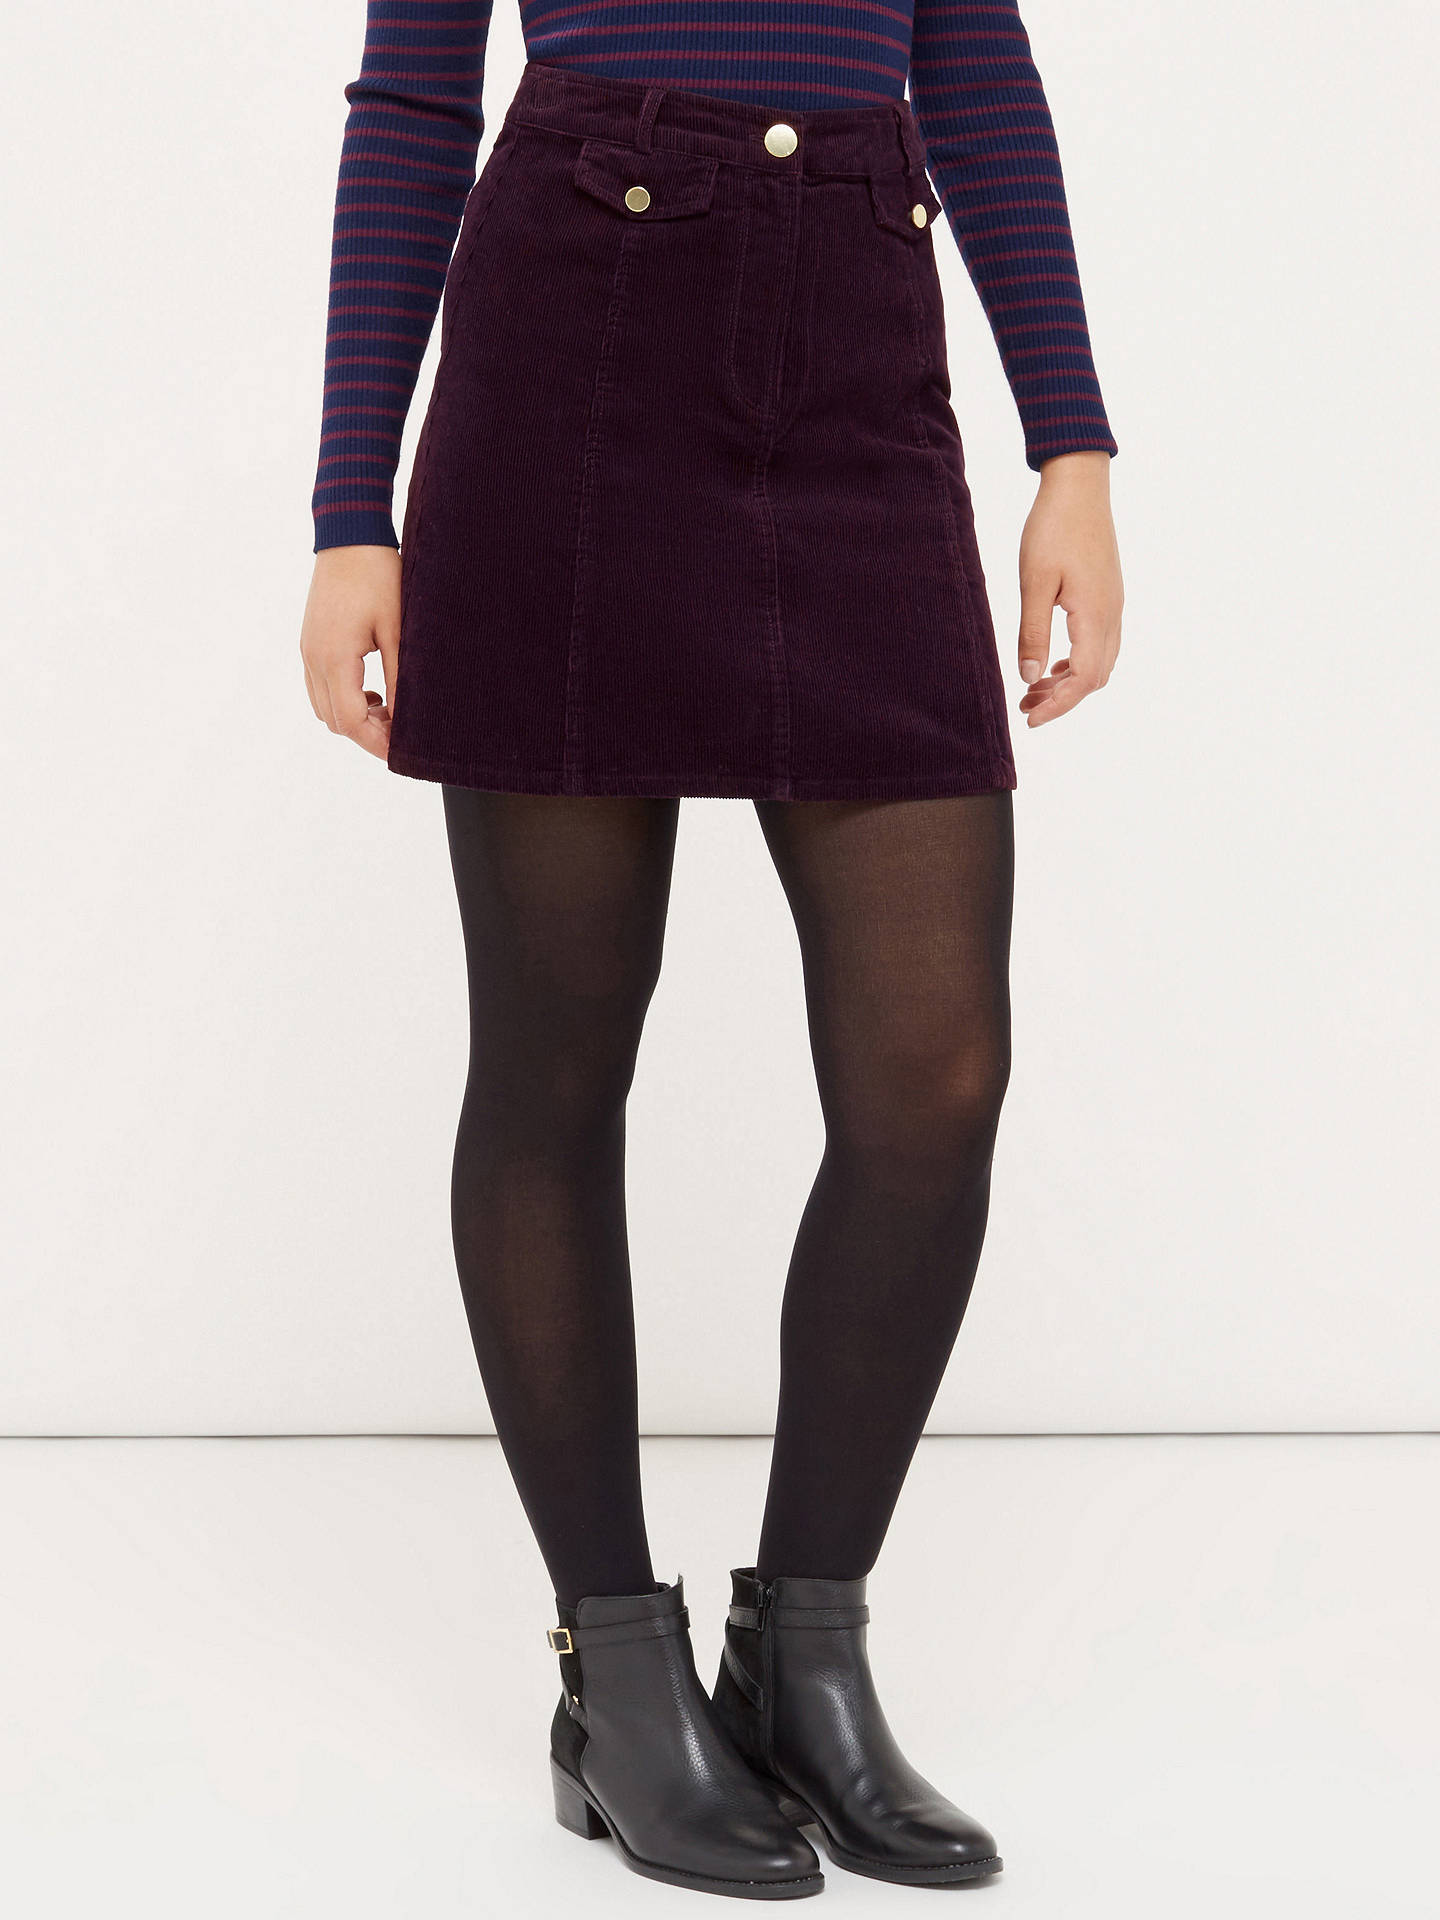 8c979da84 ... Buy Oasis Cord Pocket Mini Skirt, Burgundy, 8 Online at johnlewis.com  ...